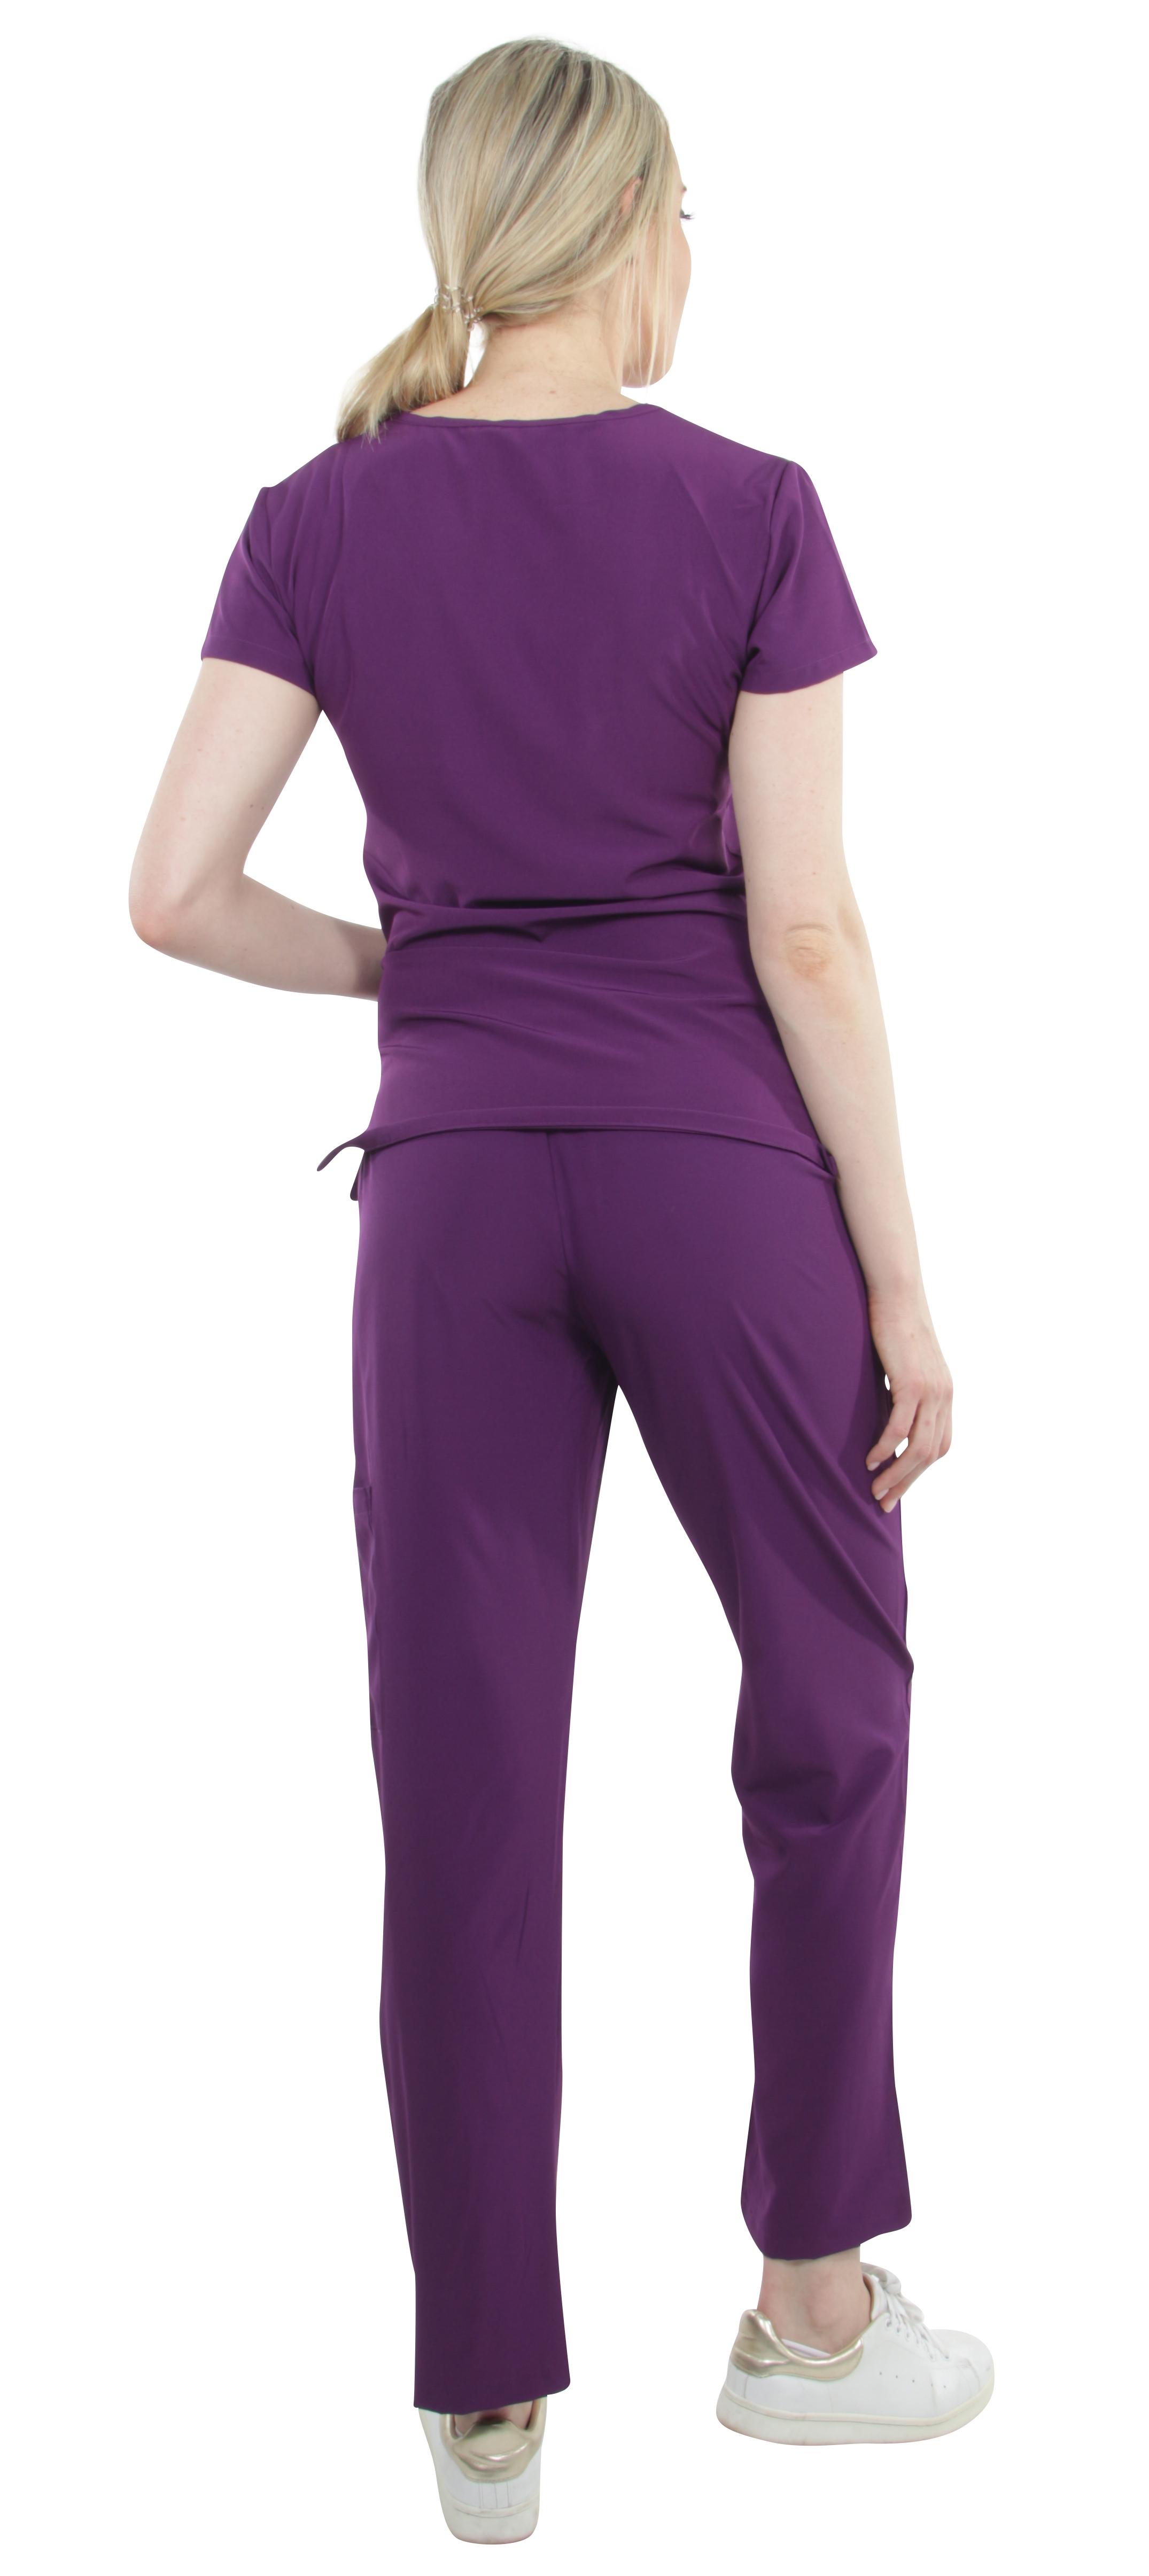 Unisex-Performance-Stretch-Medical-Uniform-Five-Pockets-V-Neck-Scrubs-Sets miniature 41